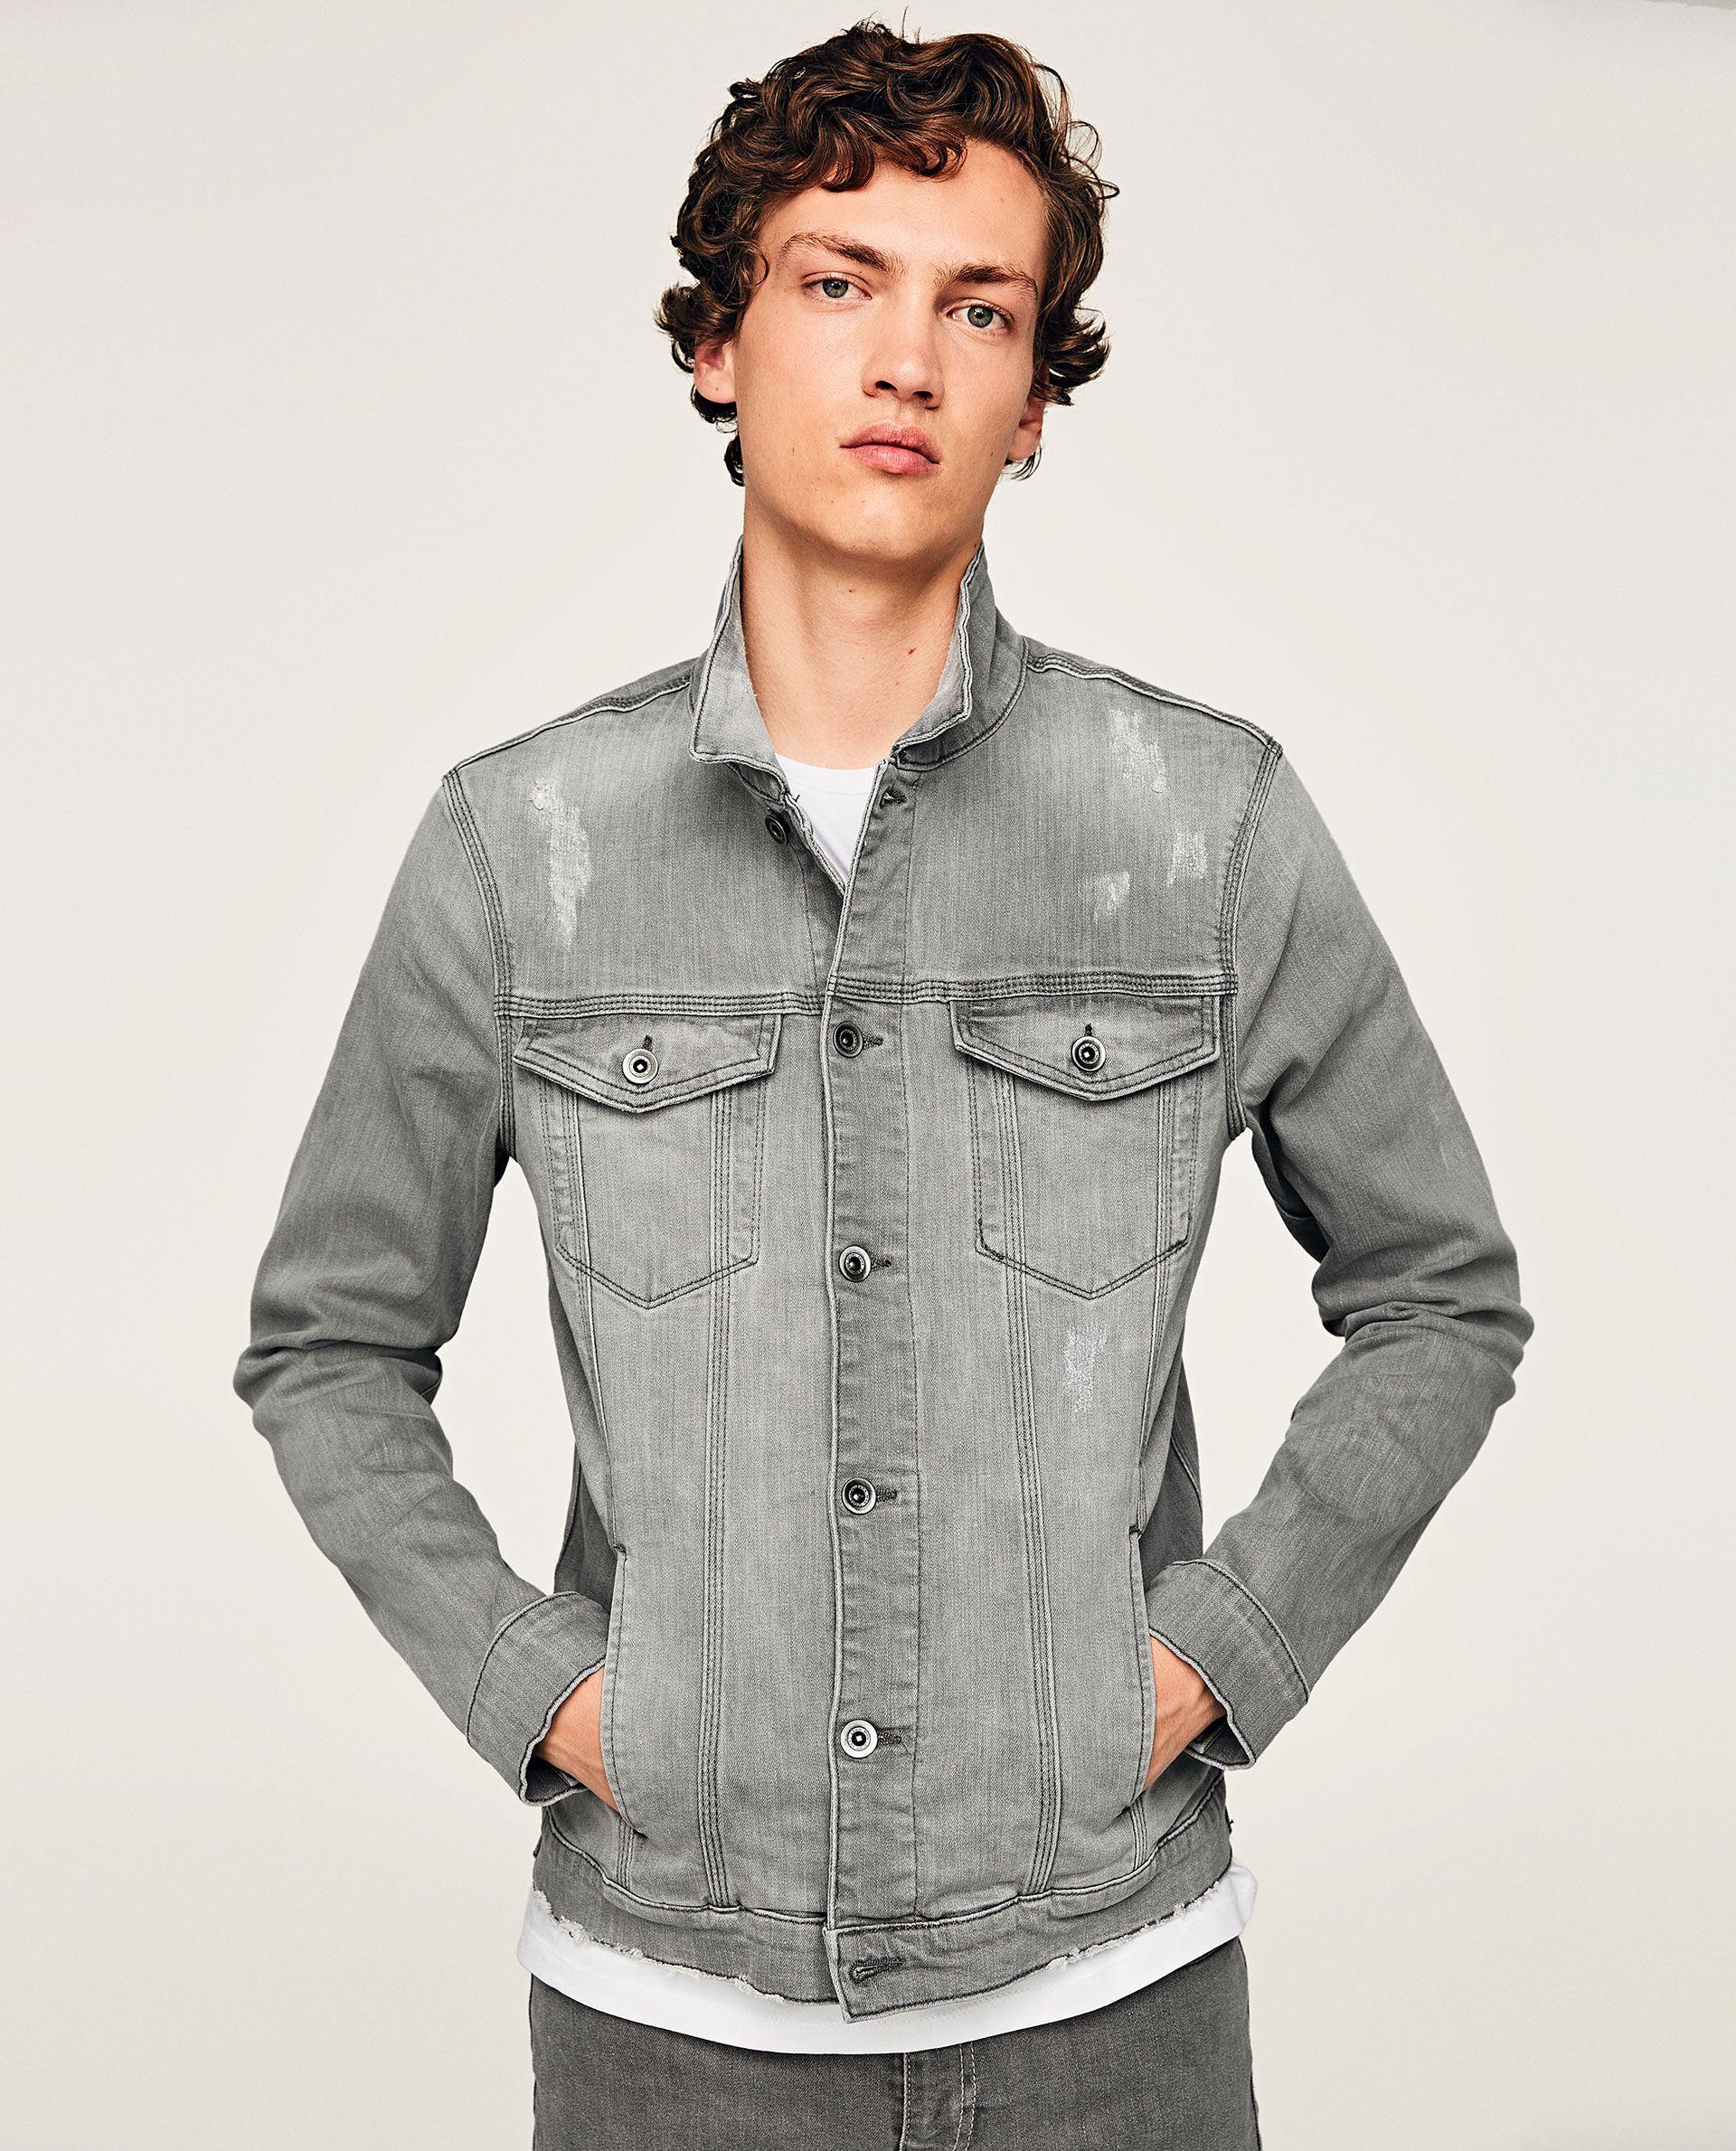 Image 1 Of Denim Jacket From Zara Denim Jacket Men Stylish Jackets Zara Man [ 2379 x 1920 Pixel ]